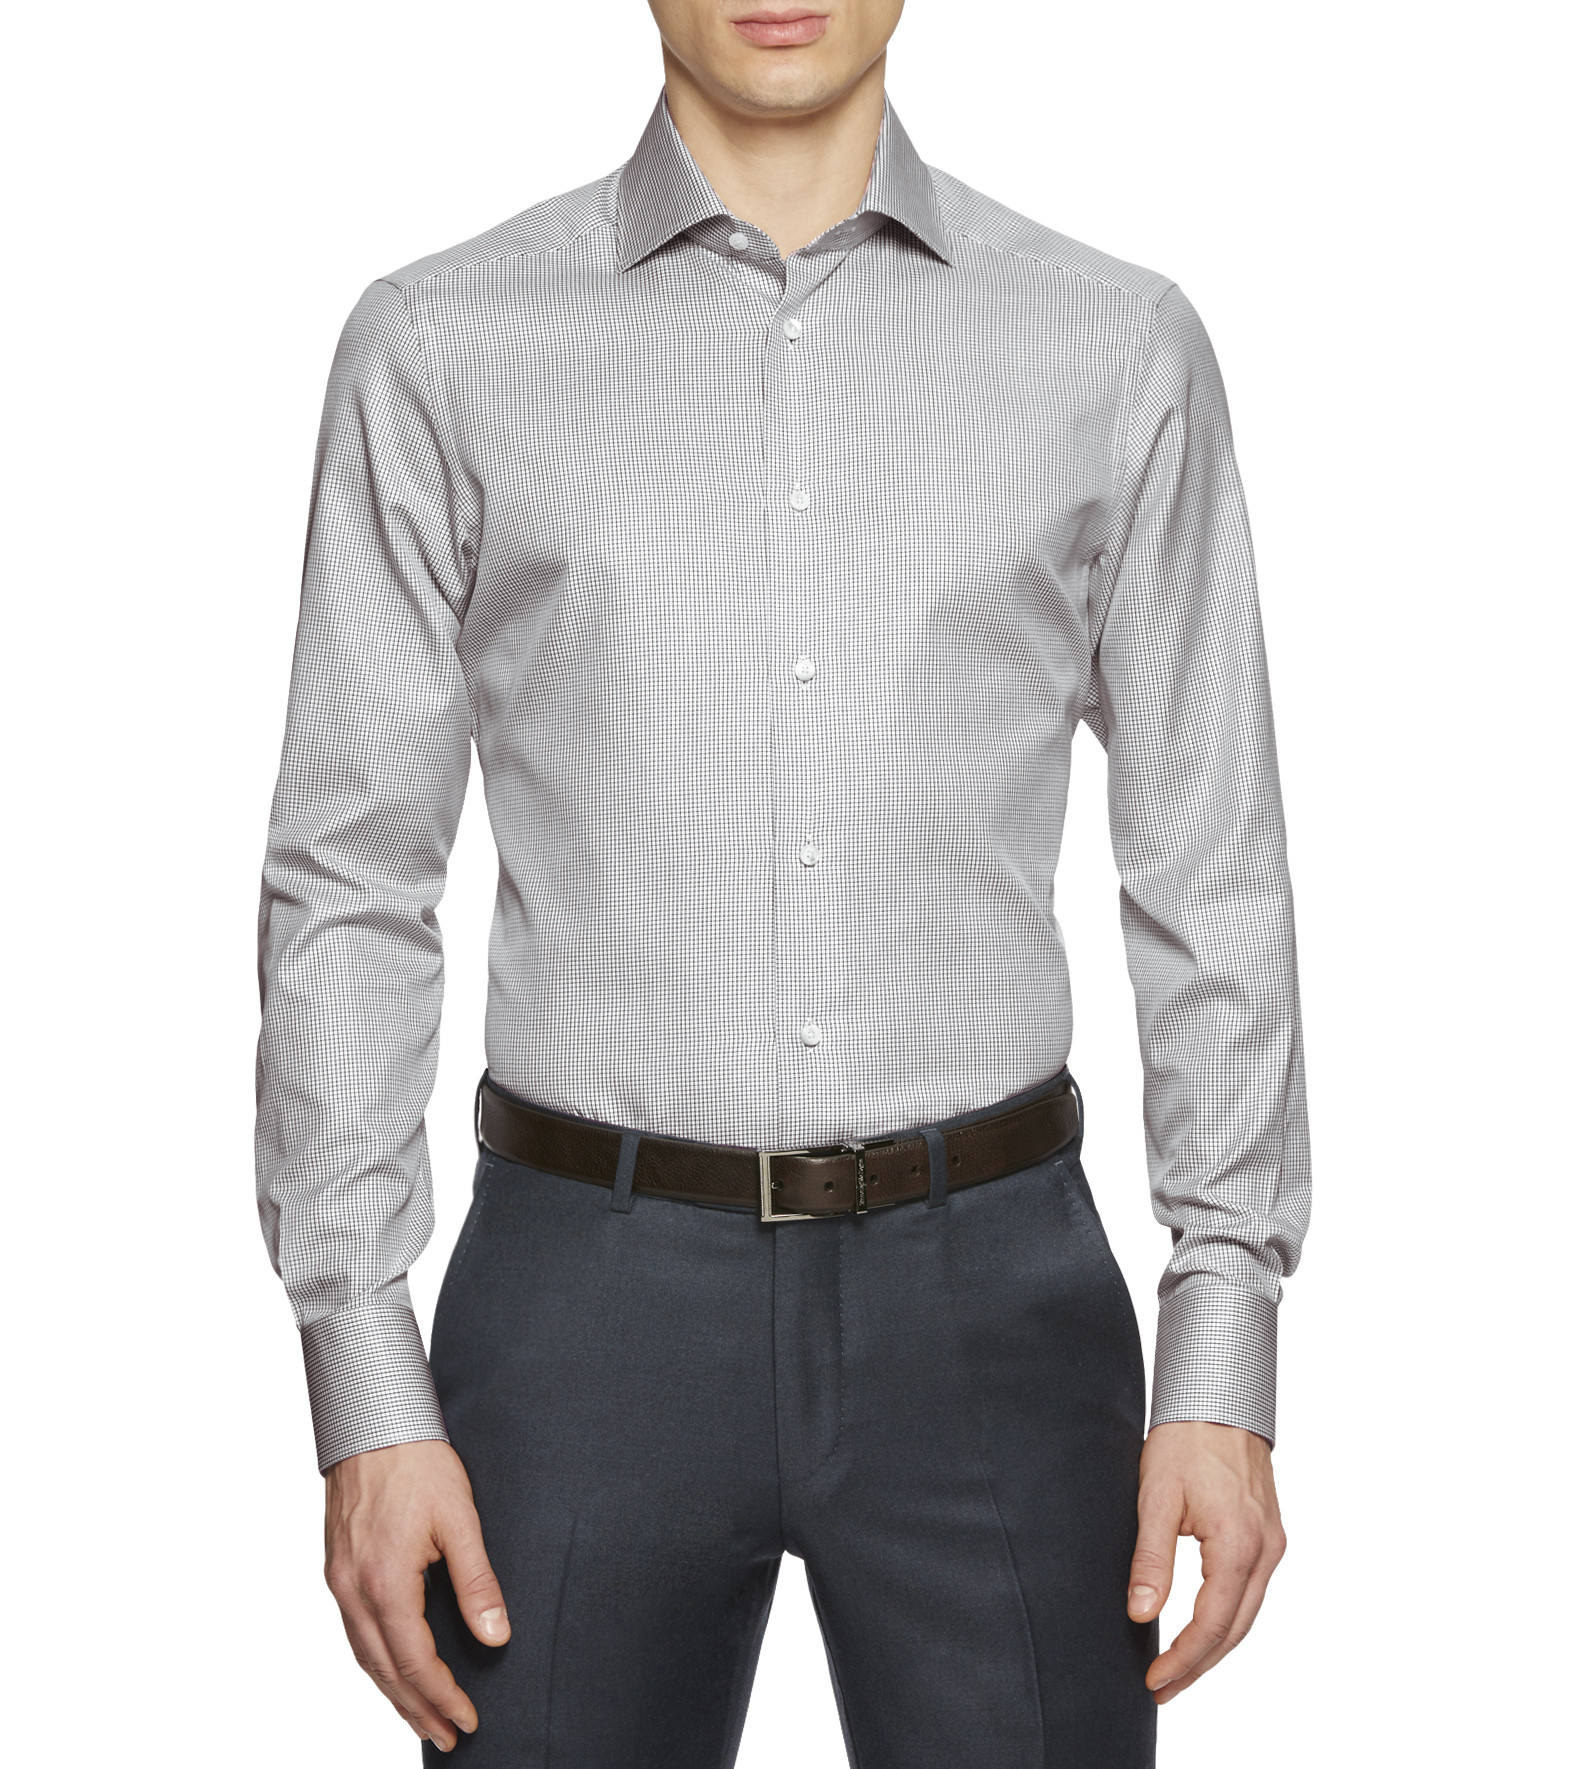 ermenegildo zegna white blue trofeo cotton shirt in blue for men lyst. Black Bedroom Furniture Sets. Home Design Ideas